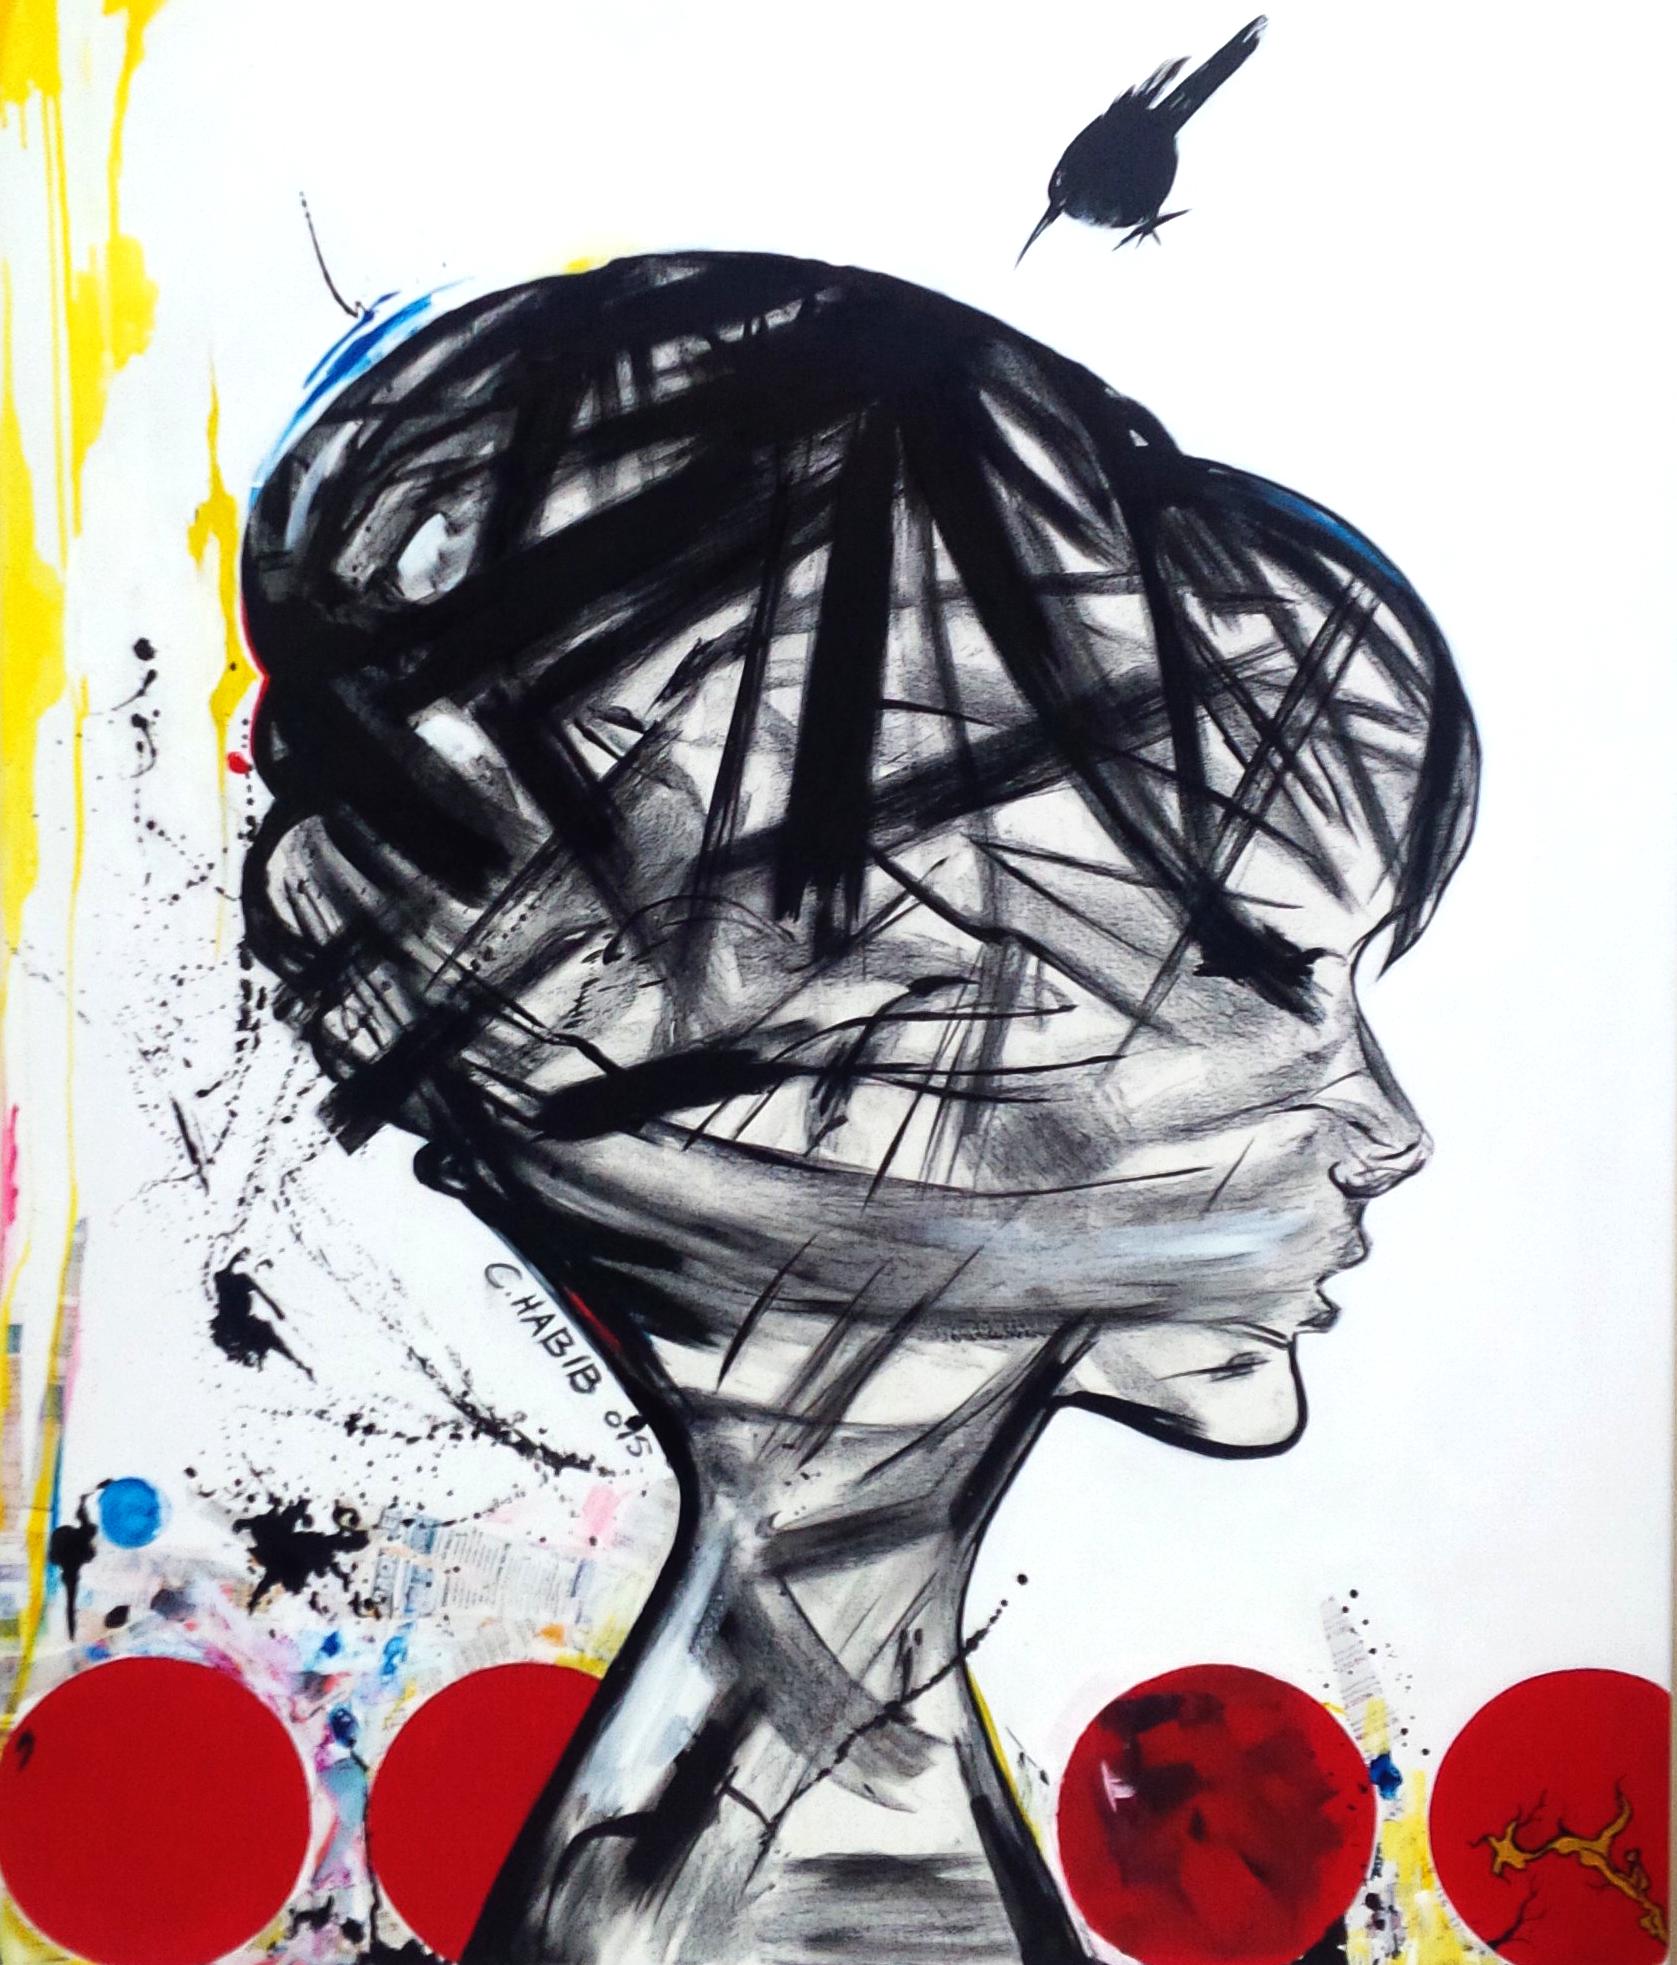 BEYOND - Acrylic on canvas- 120x100cm- C